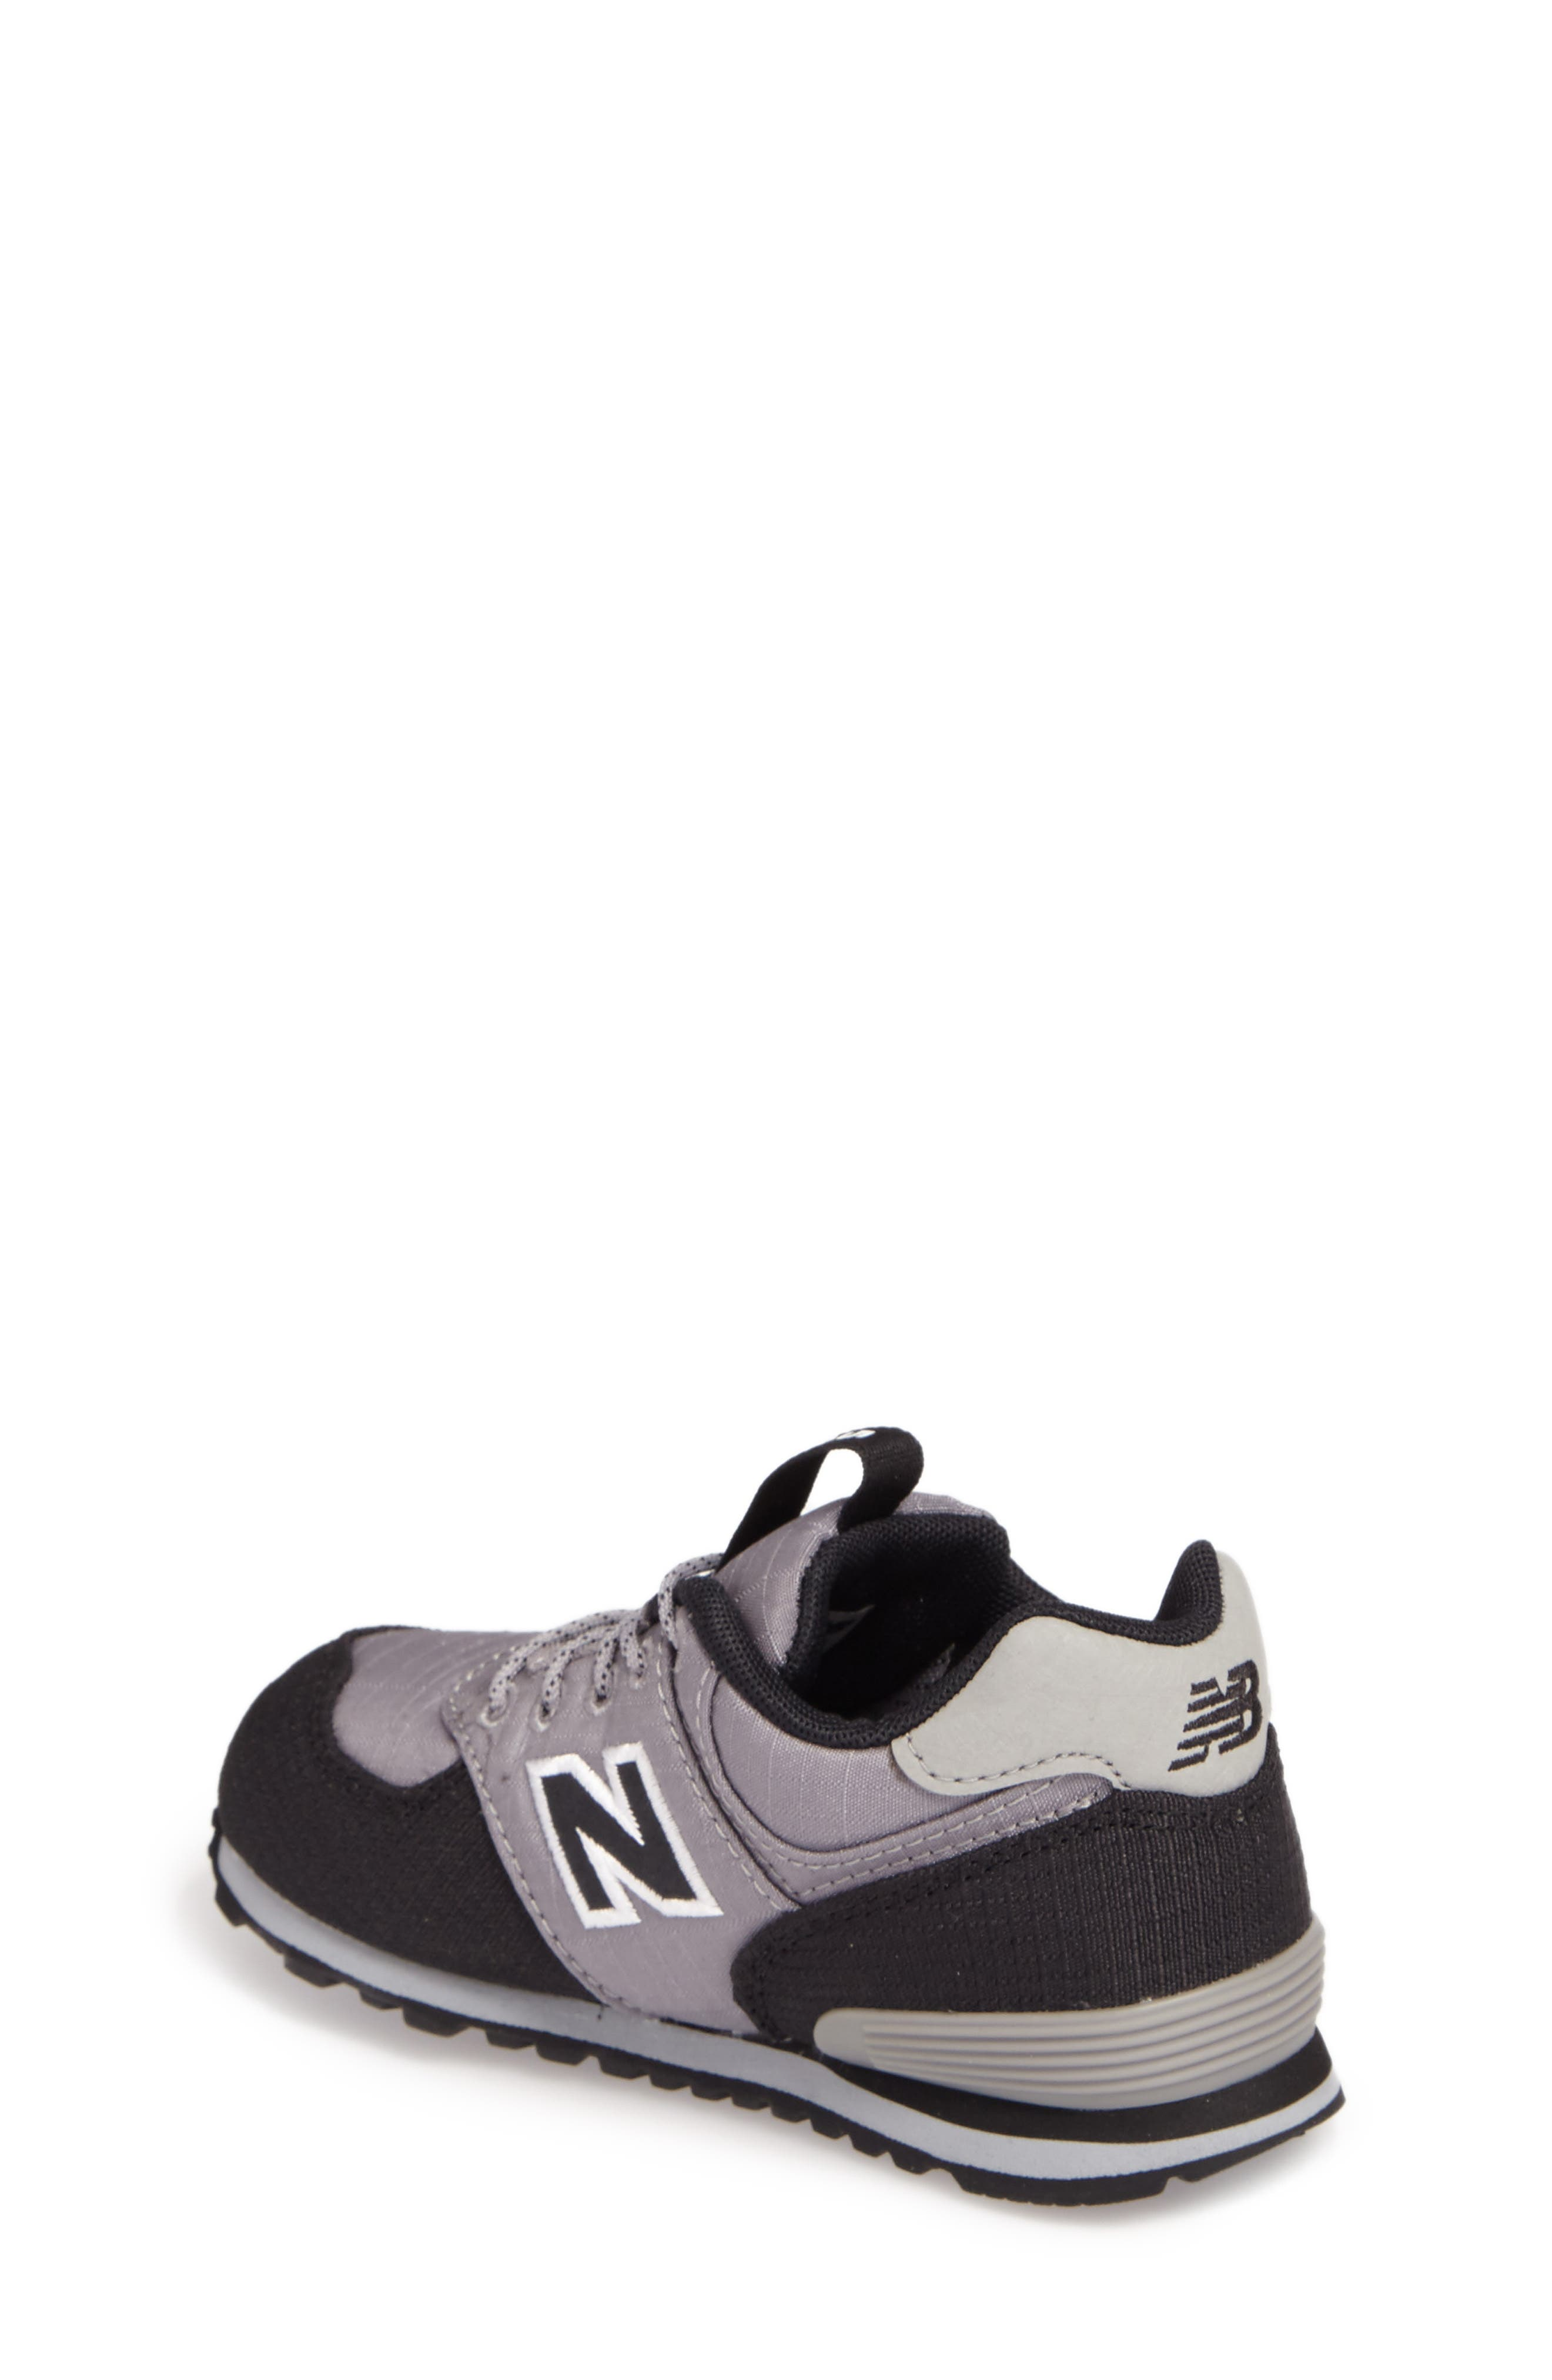 Alternate Image 2  - New Balance 990 Sneaker (Baby, Walker & Toddler)